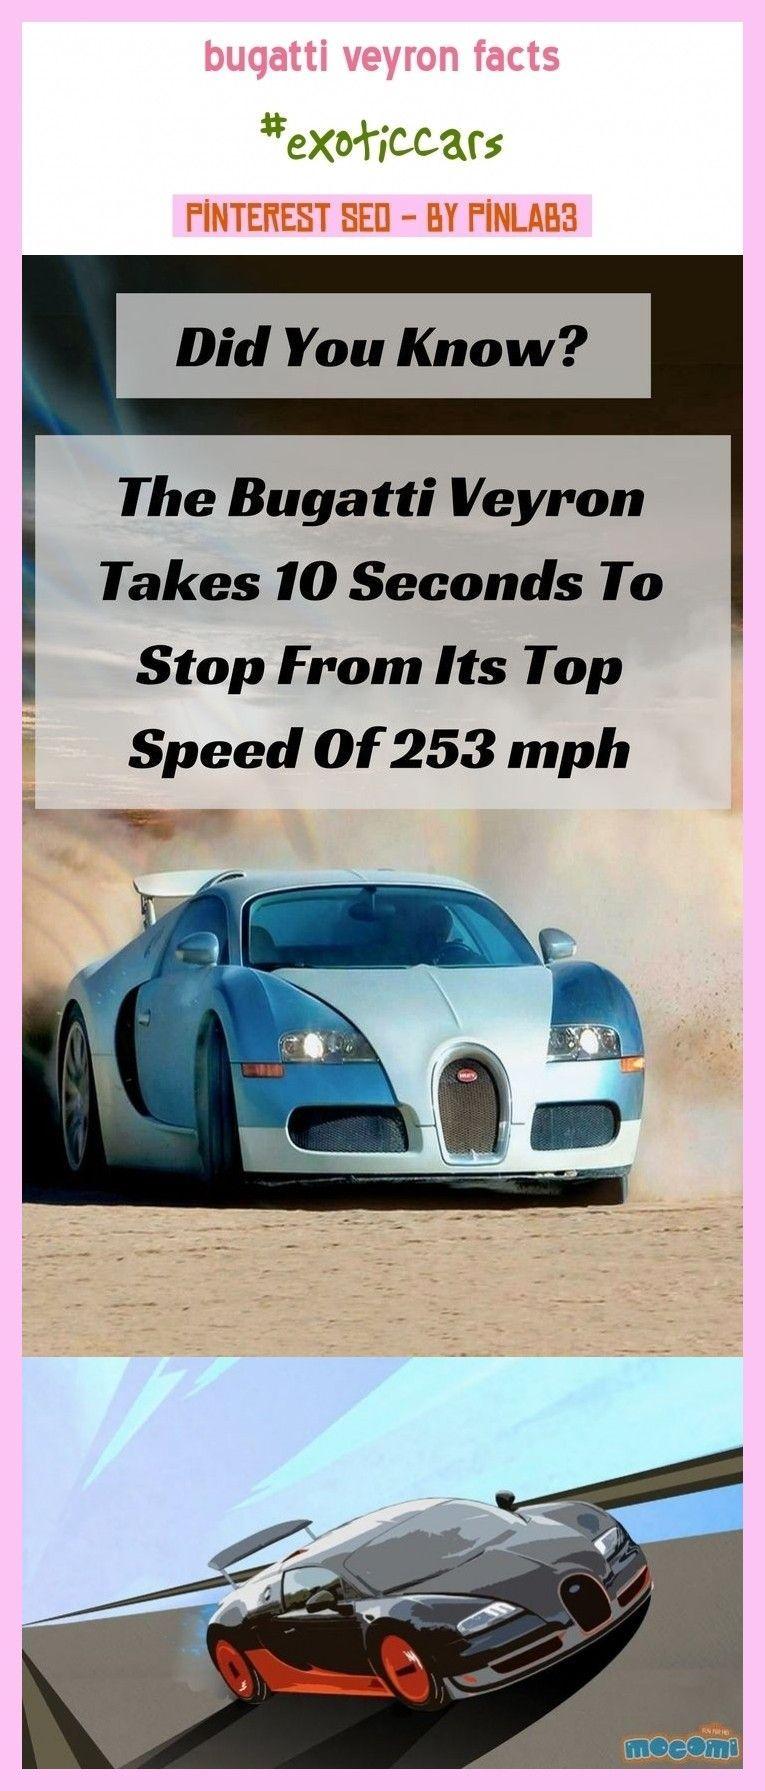 Auto Racing Bugatti Veyron Facts Bugatti Veyron Facts Bugatti